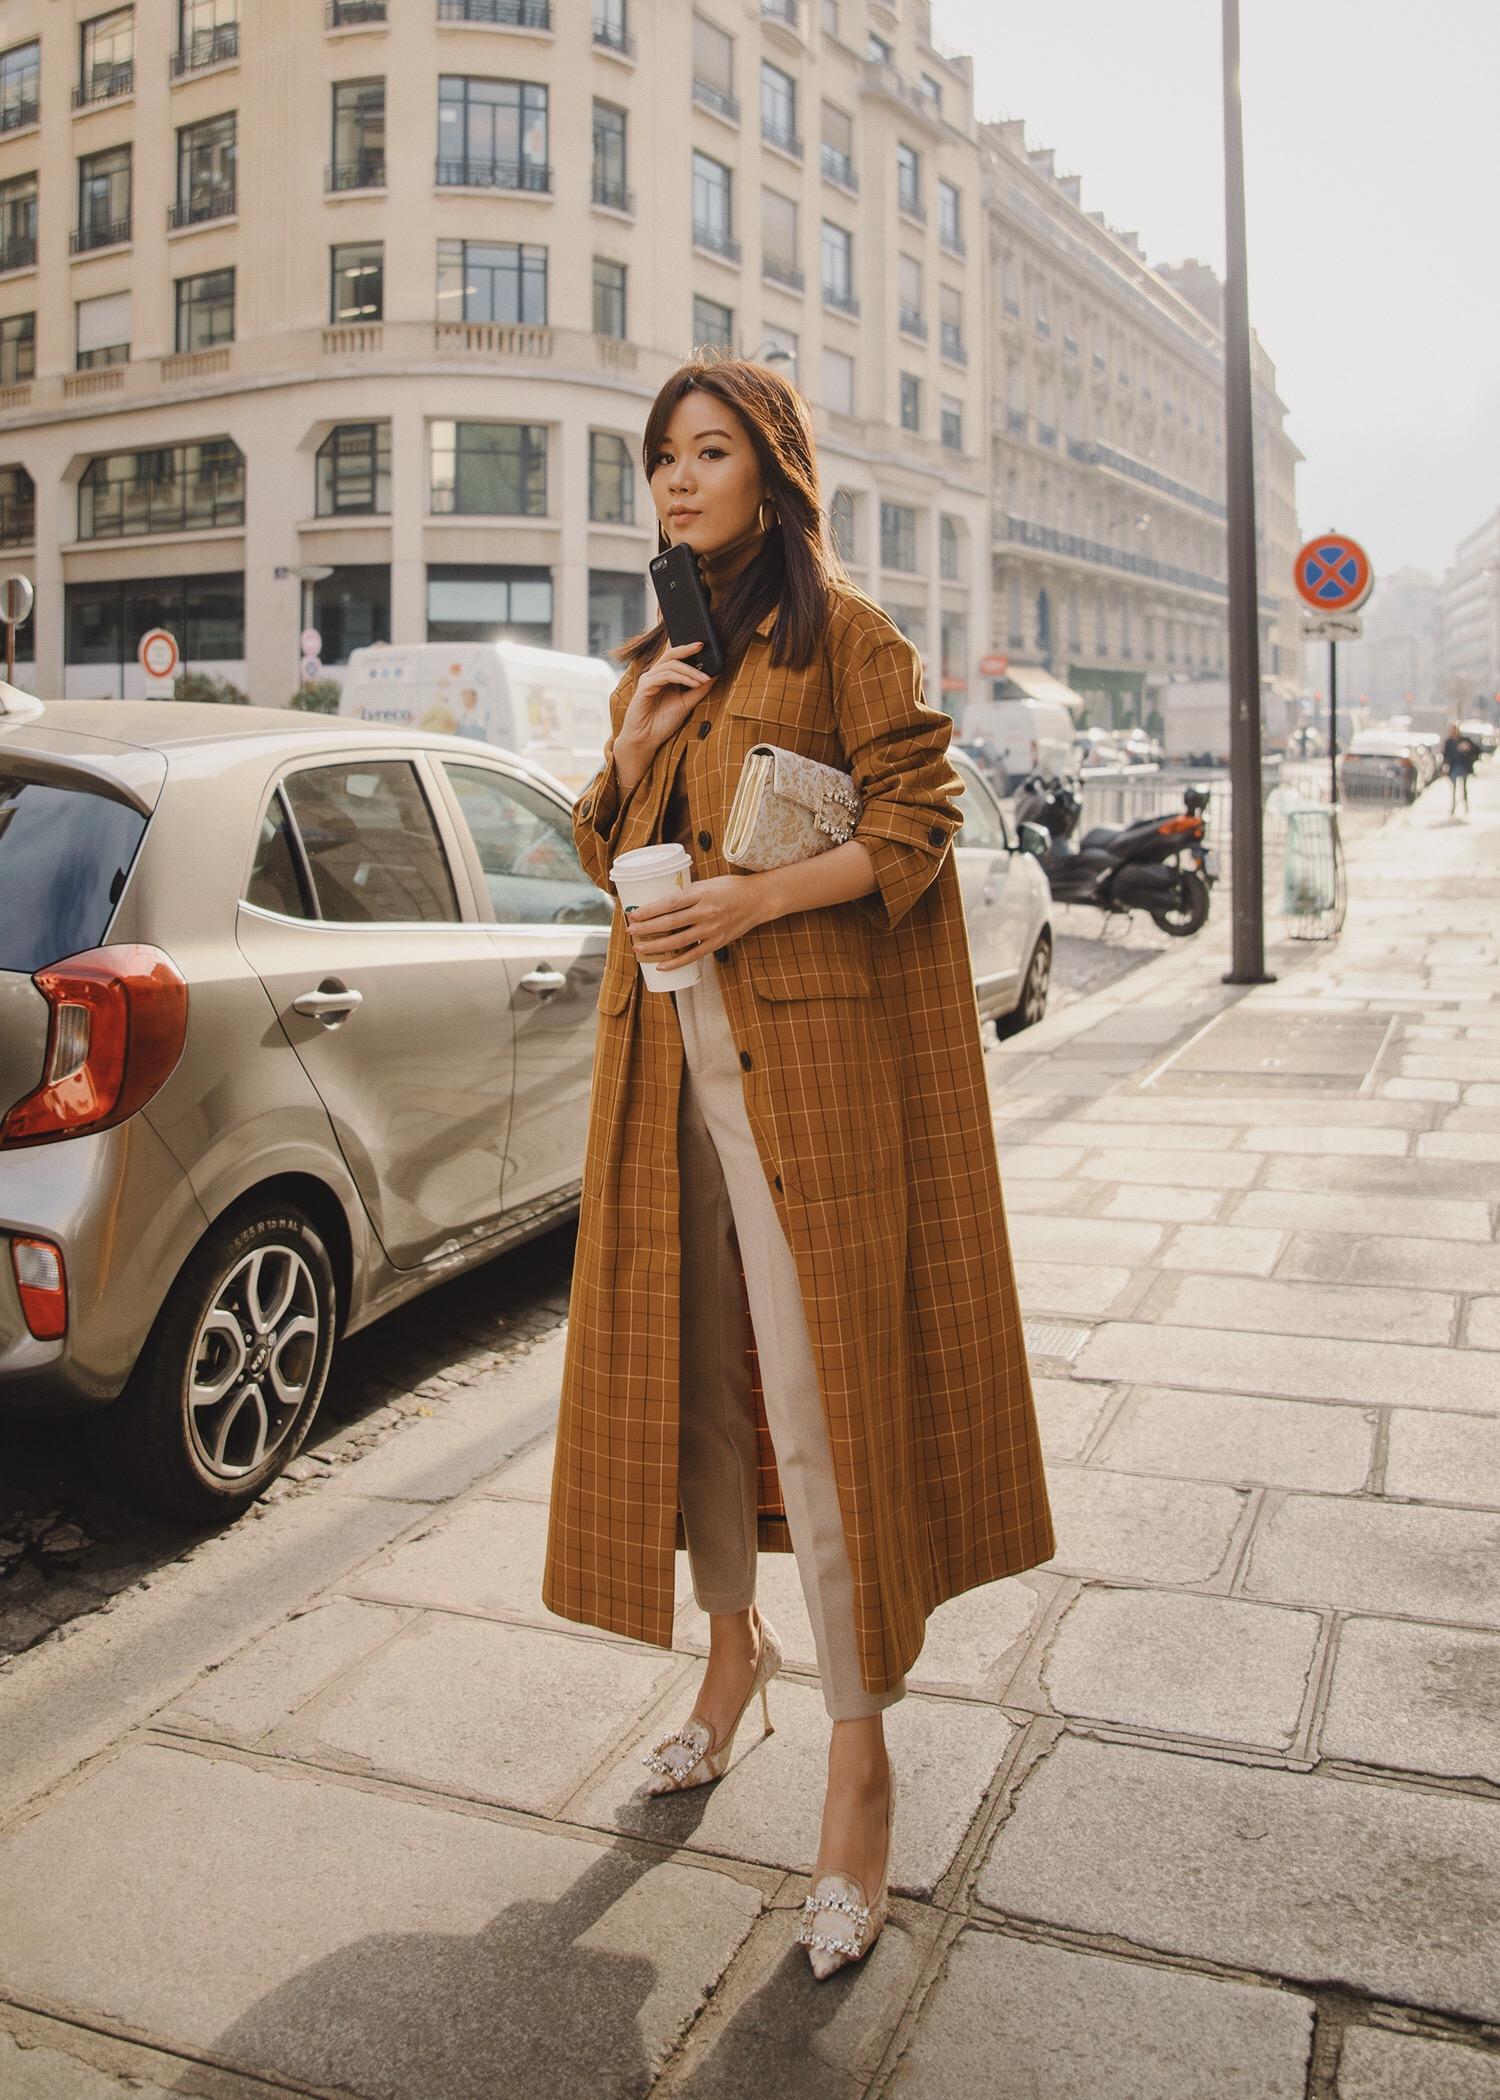 Jenny Tsang of Tsangtastic wearing Sea plaid trench coat with roger vivier pumps roger vivier clutch Paris Fashion Week